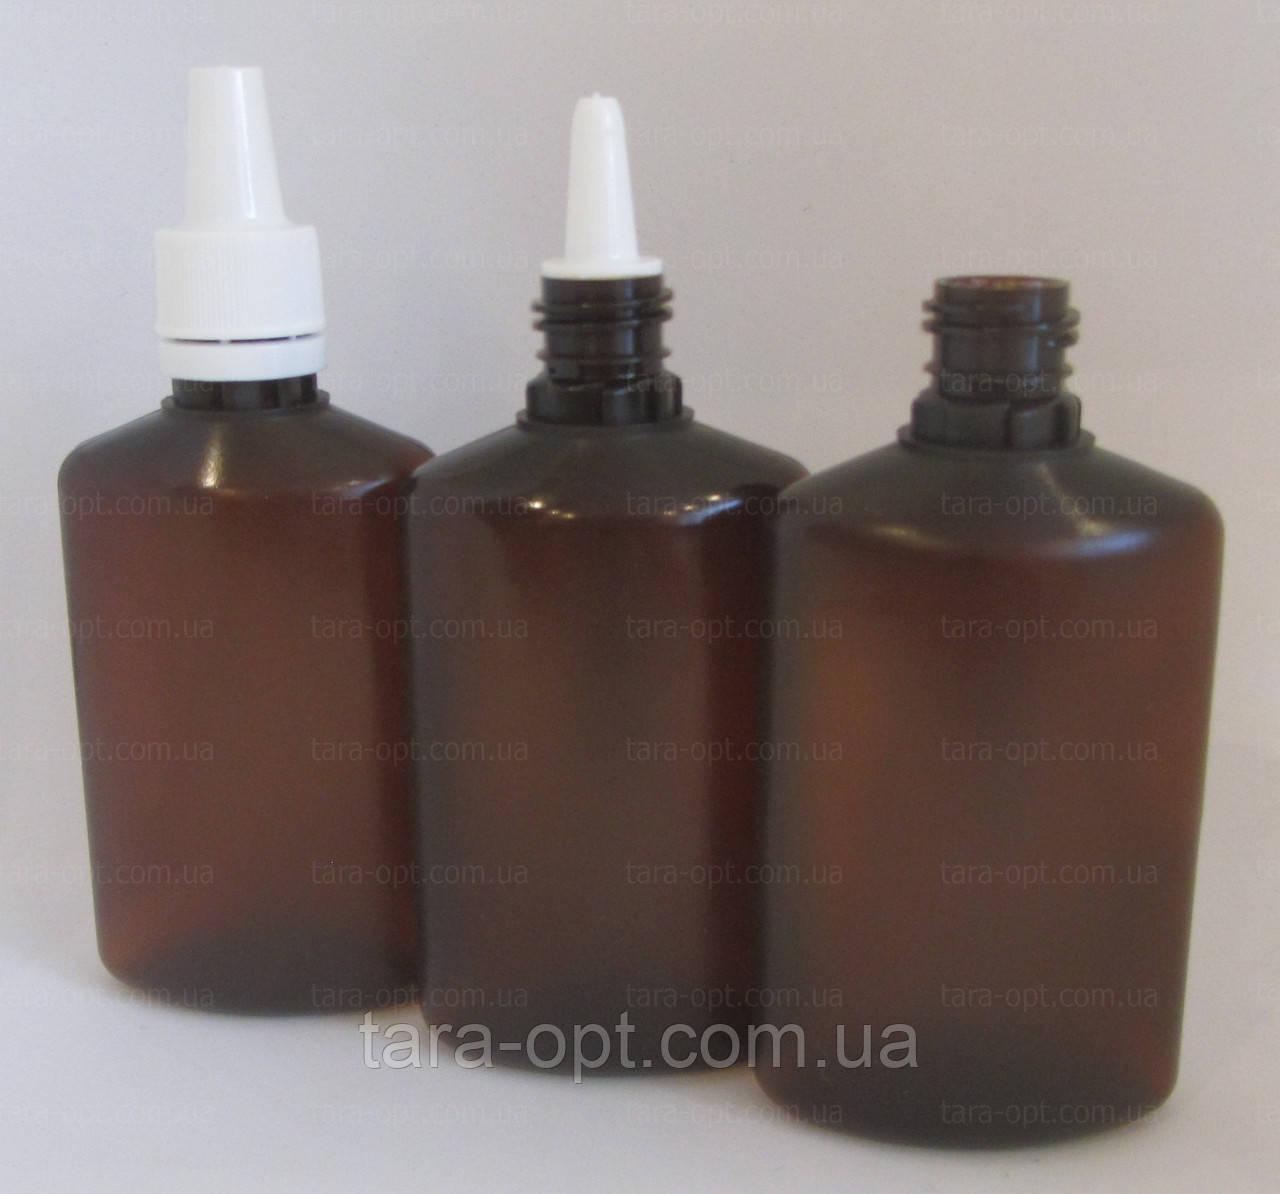 Флаконы плоские 50 мл коричневые, (Цена от 3,25 грн)*